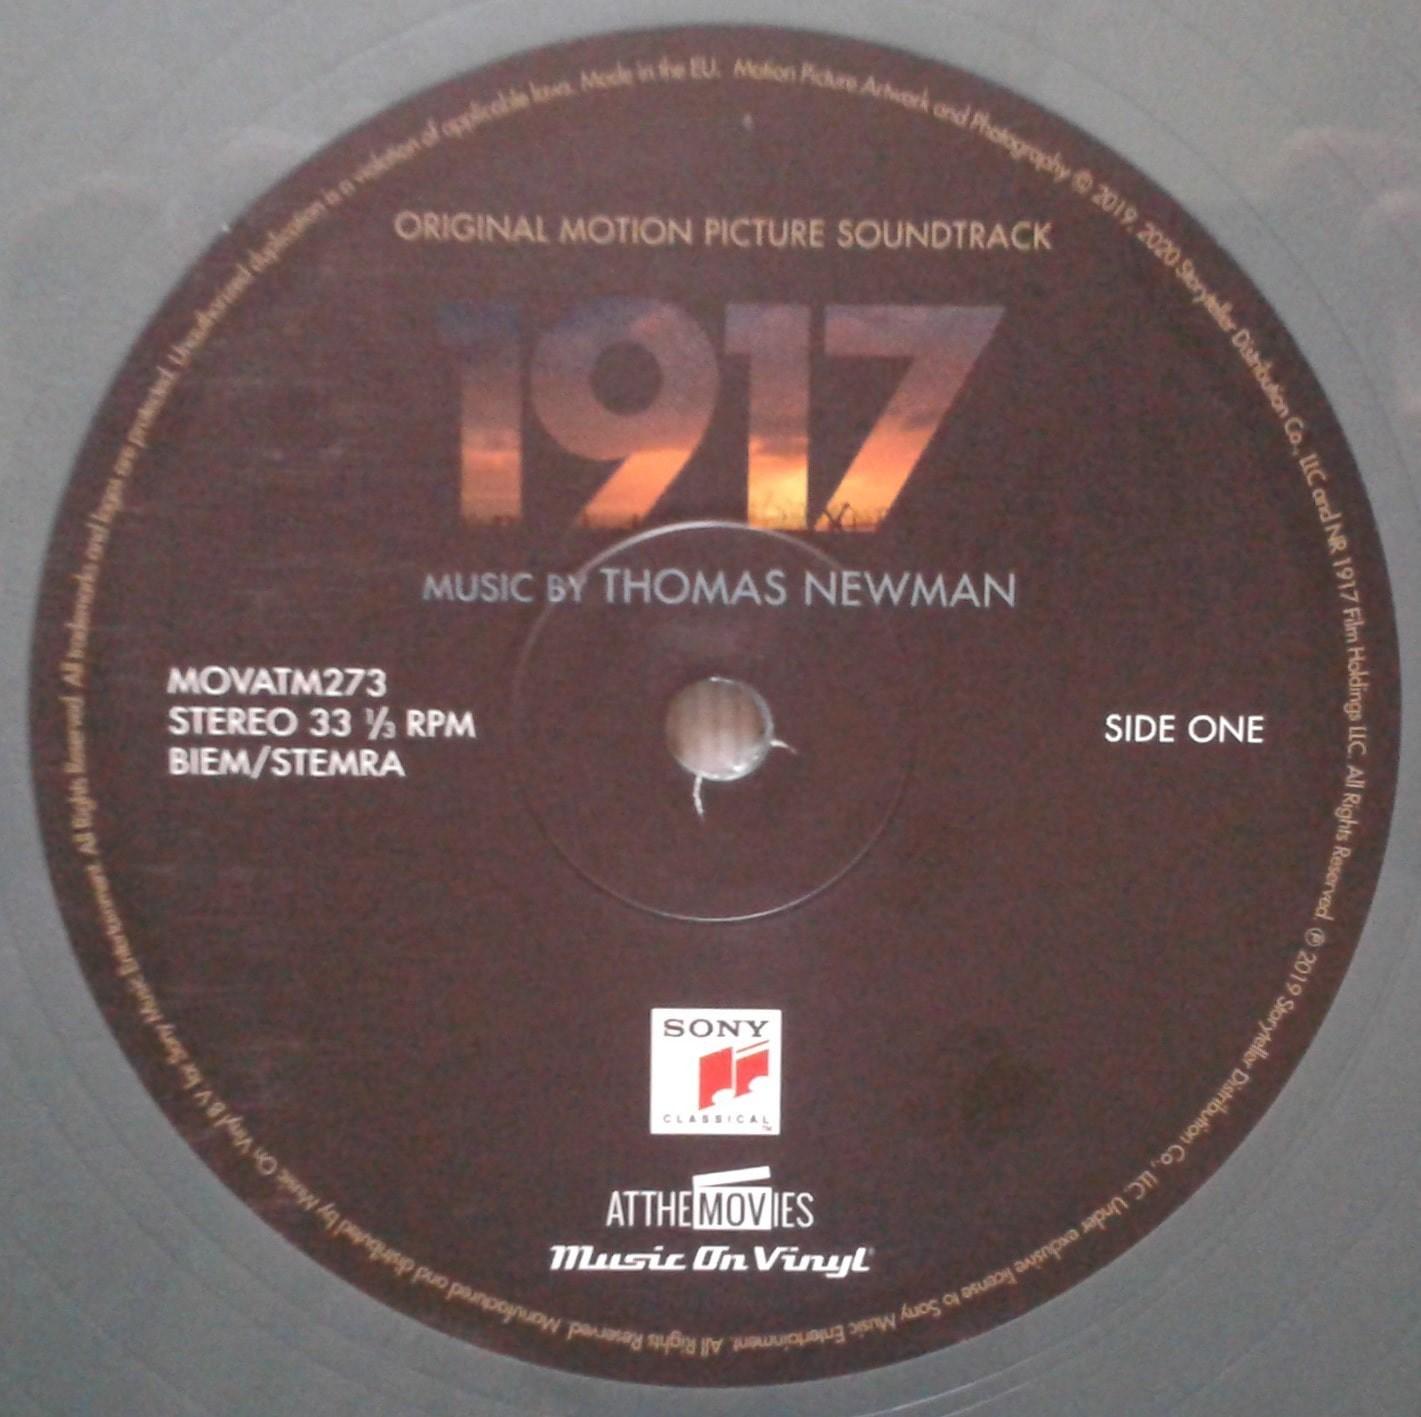 8-1917-nalepka-na-lp1-min.jpg